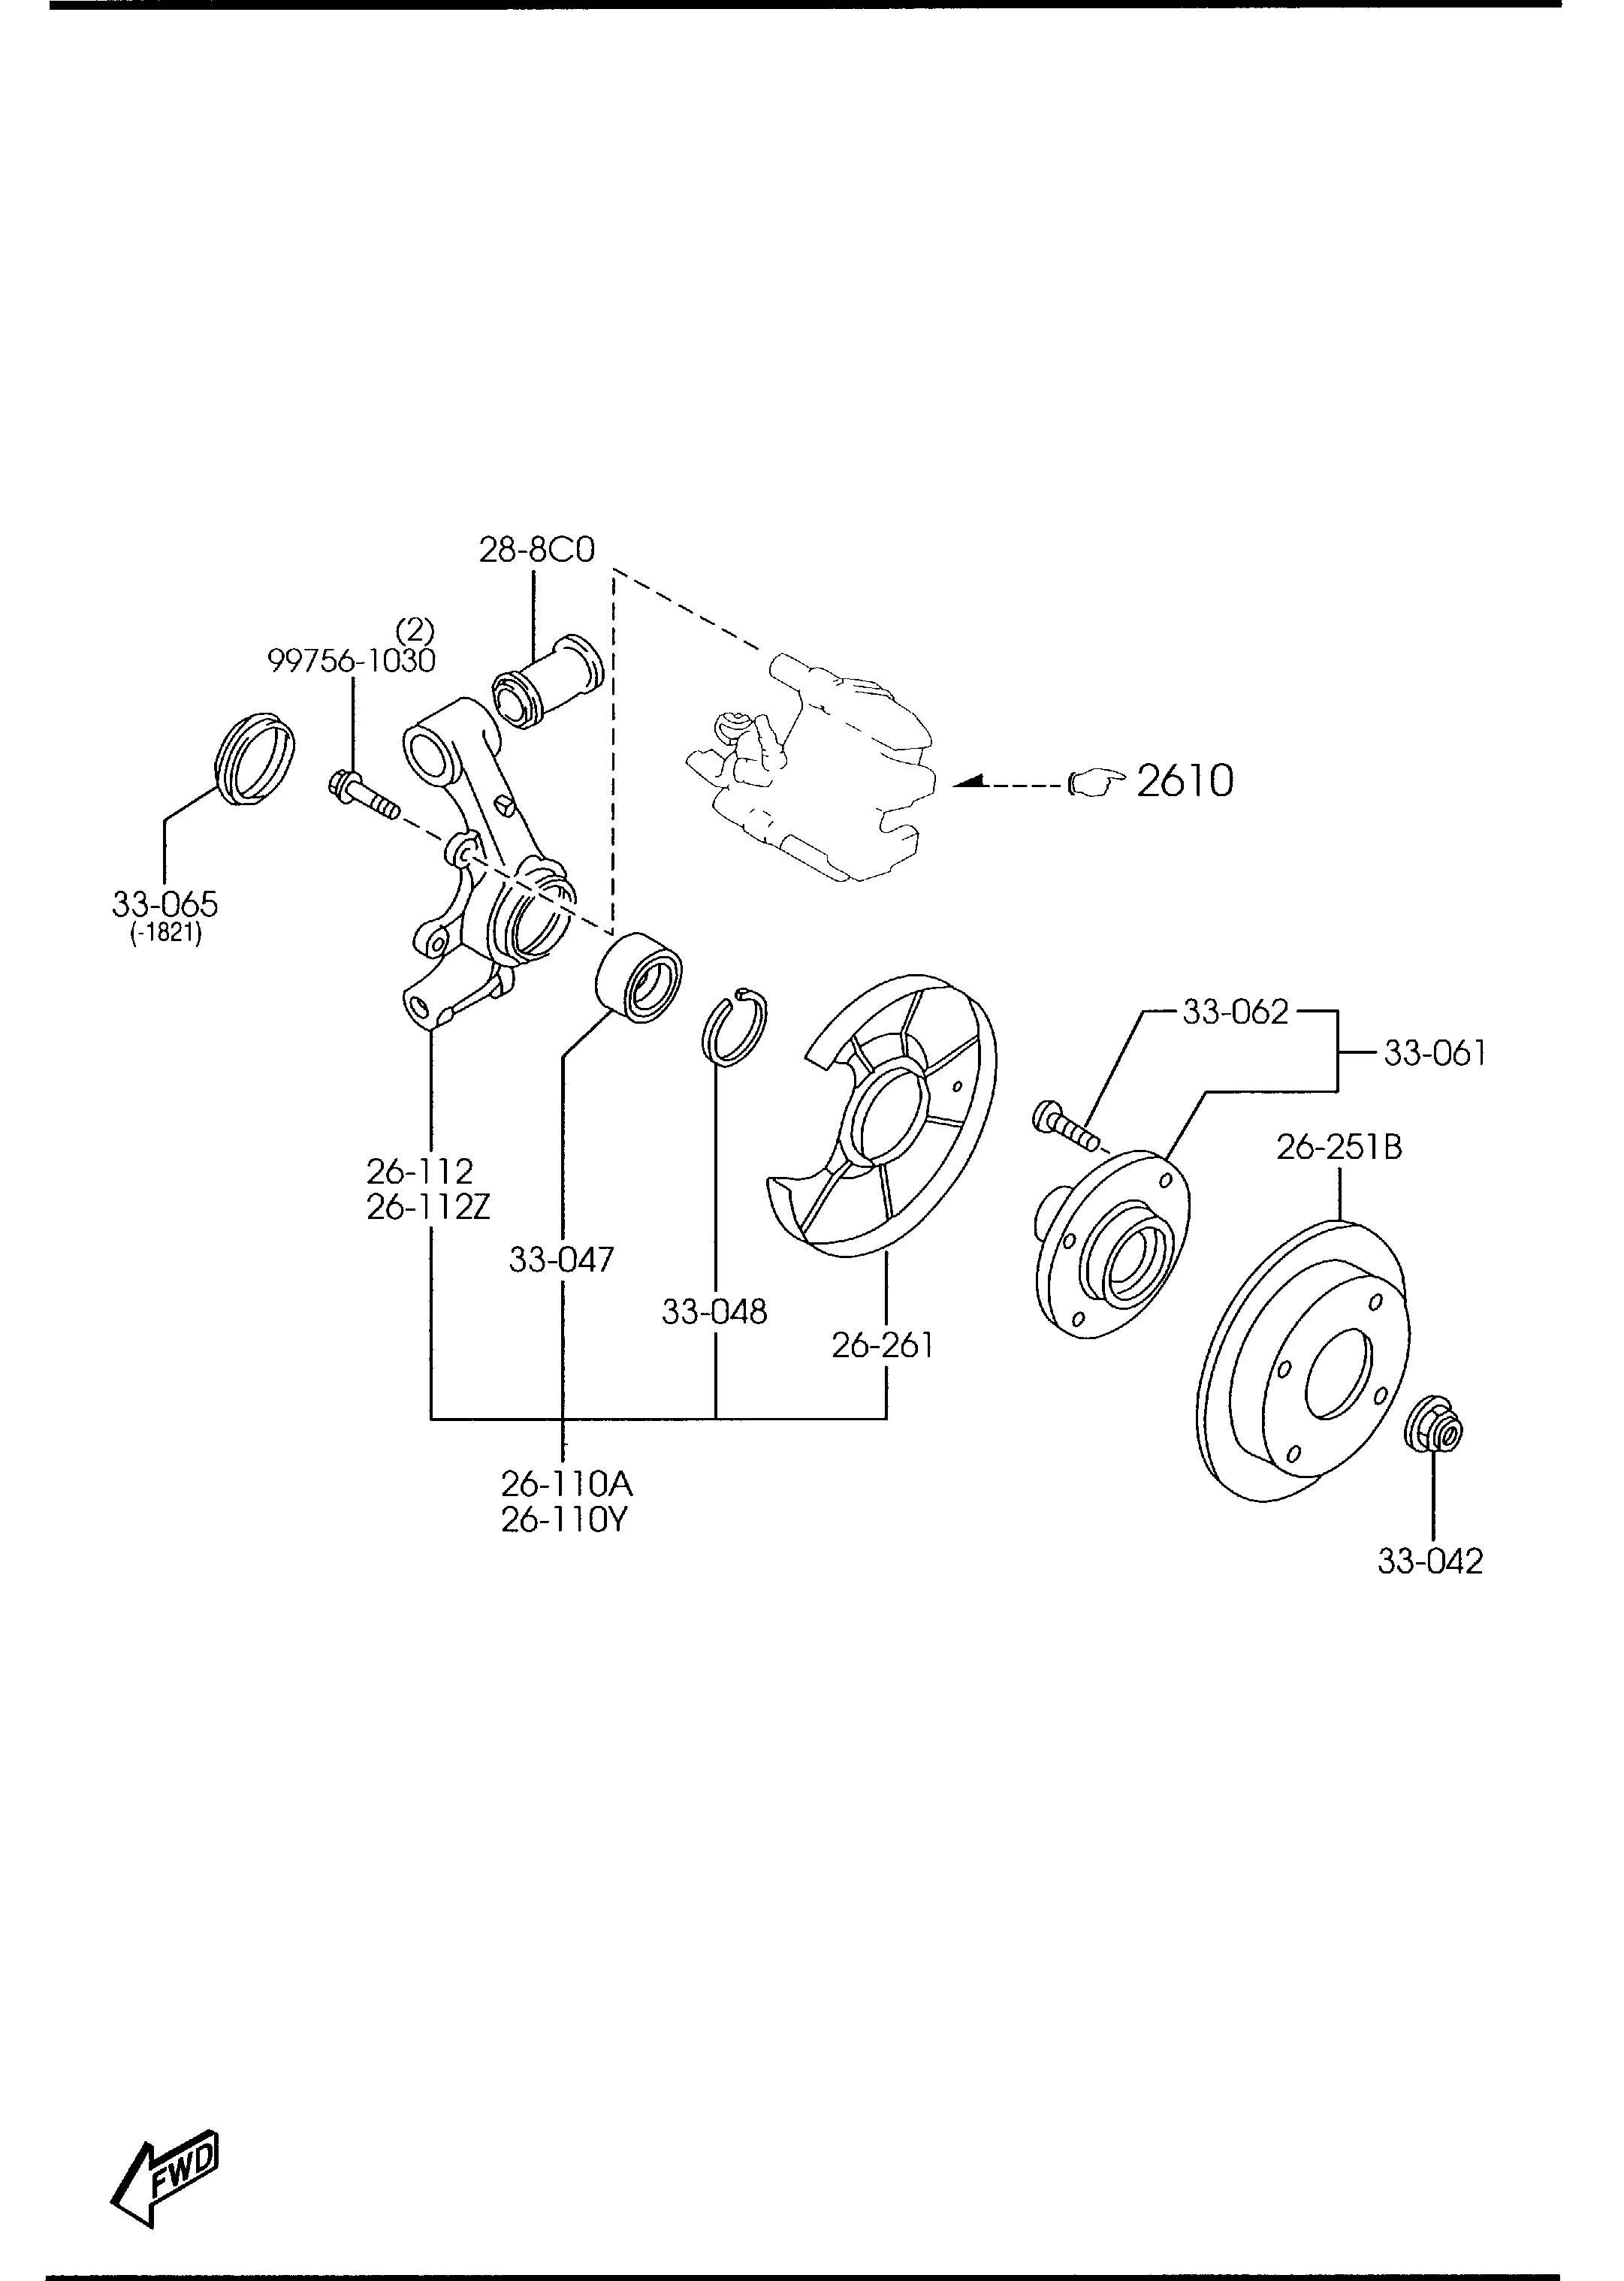 Mazda Miata Hub Wheel W Studs Wstuds